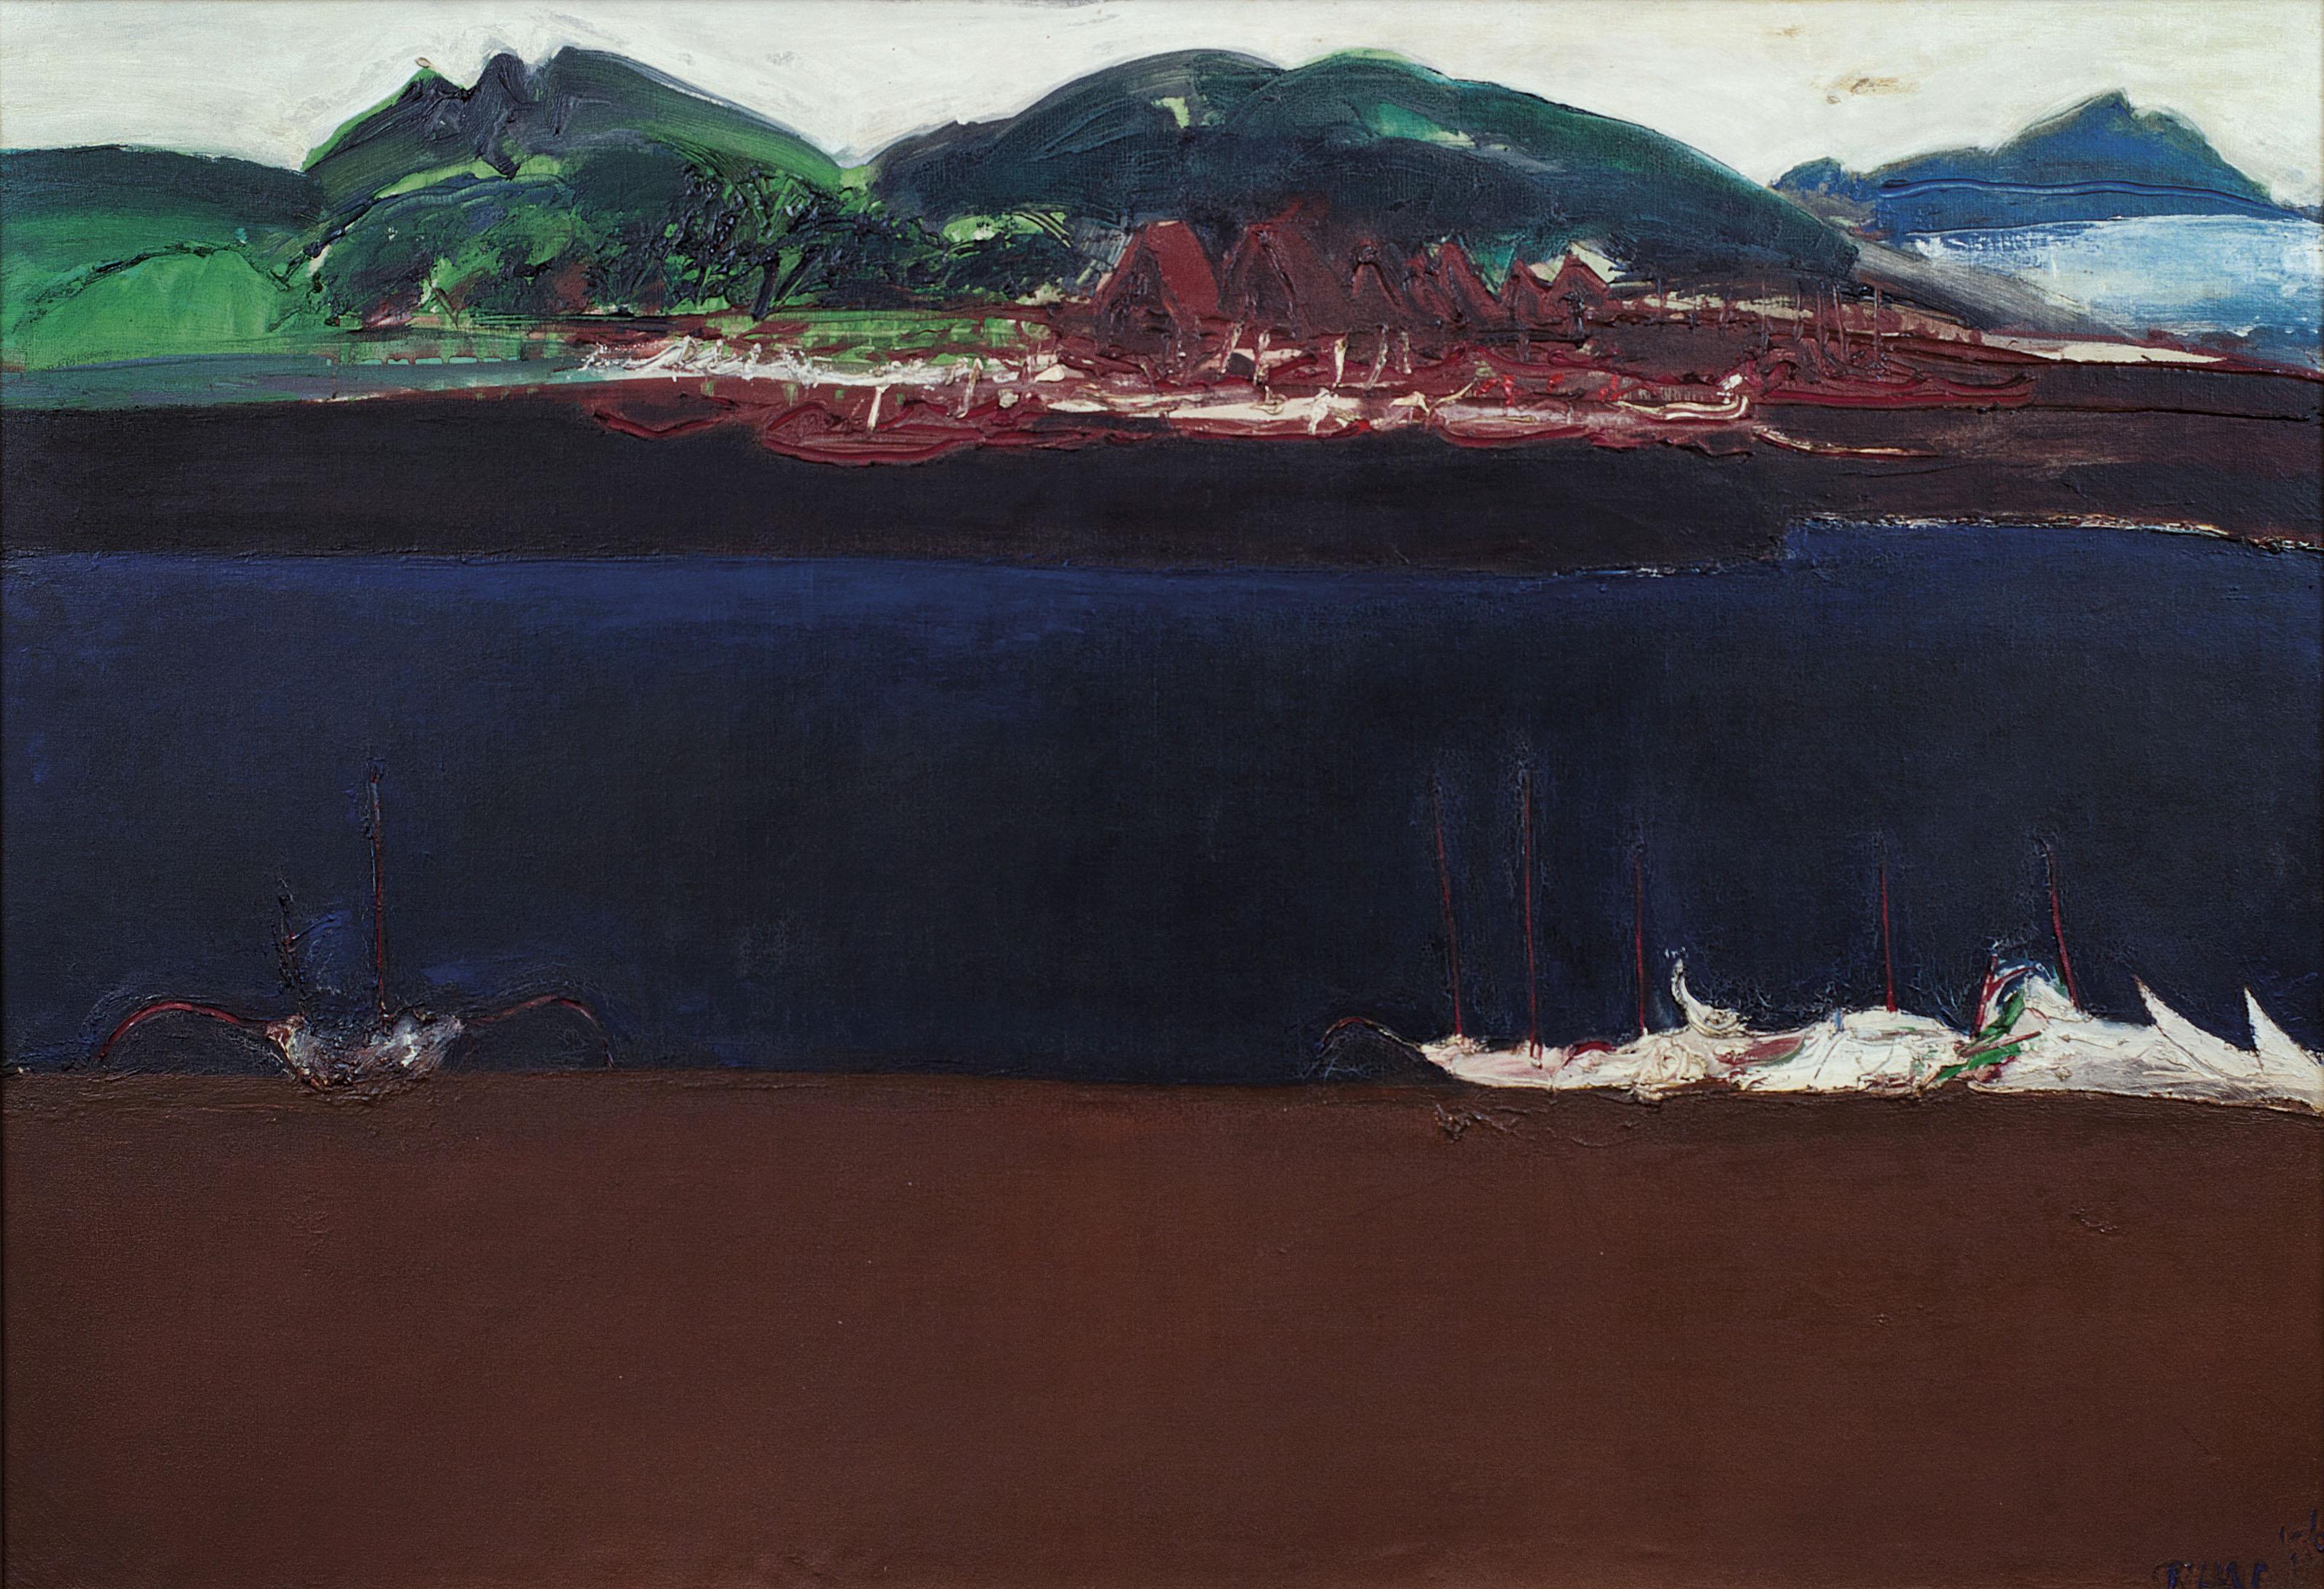 Srihadi Soedarsono, Vessels, 1976, 100 x 145 cm